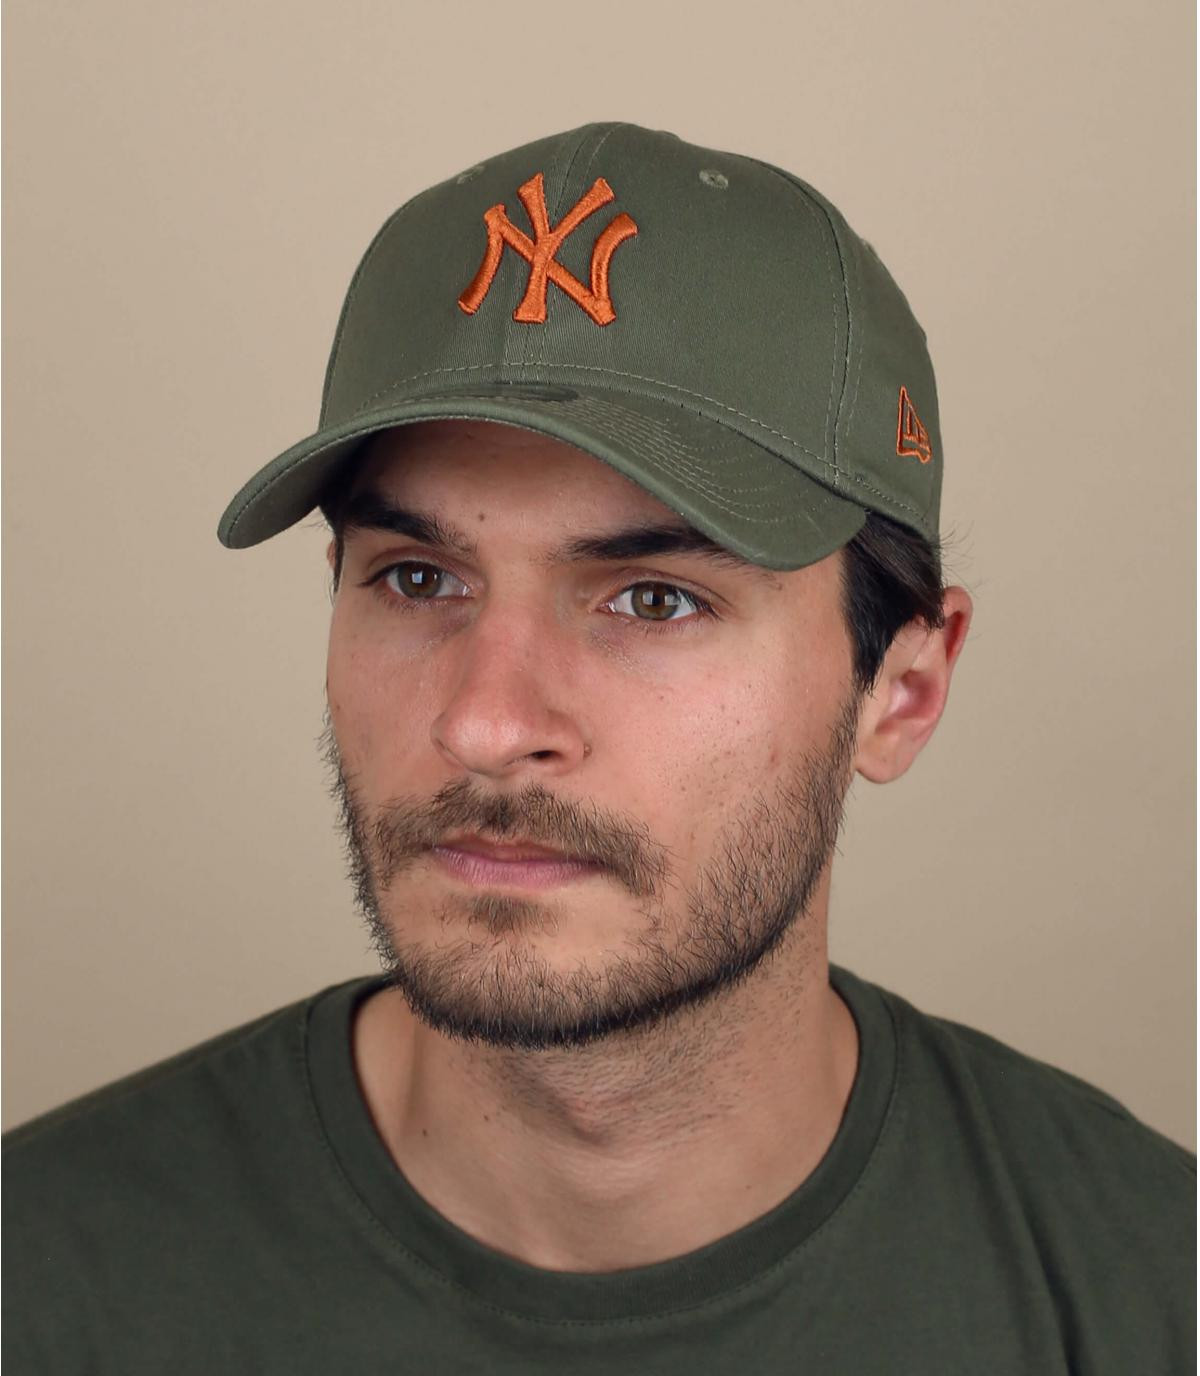 Cap stretch NY grün orange